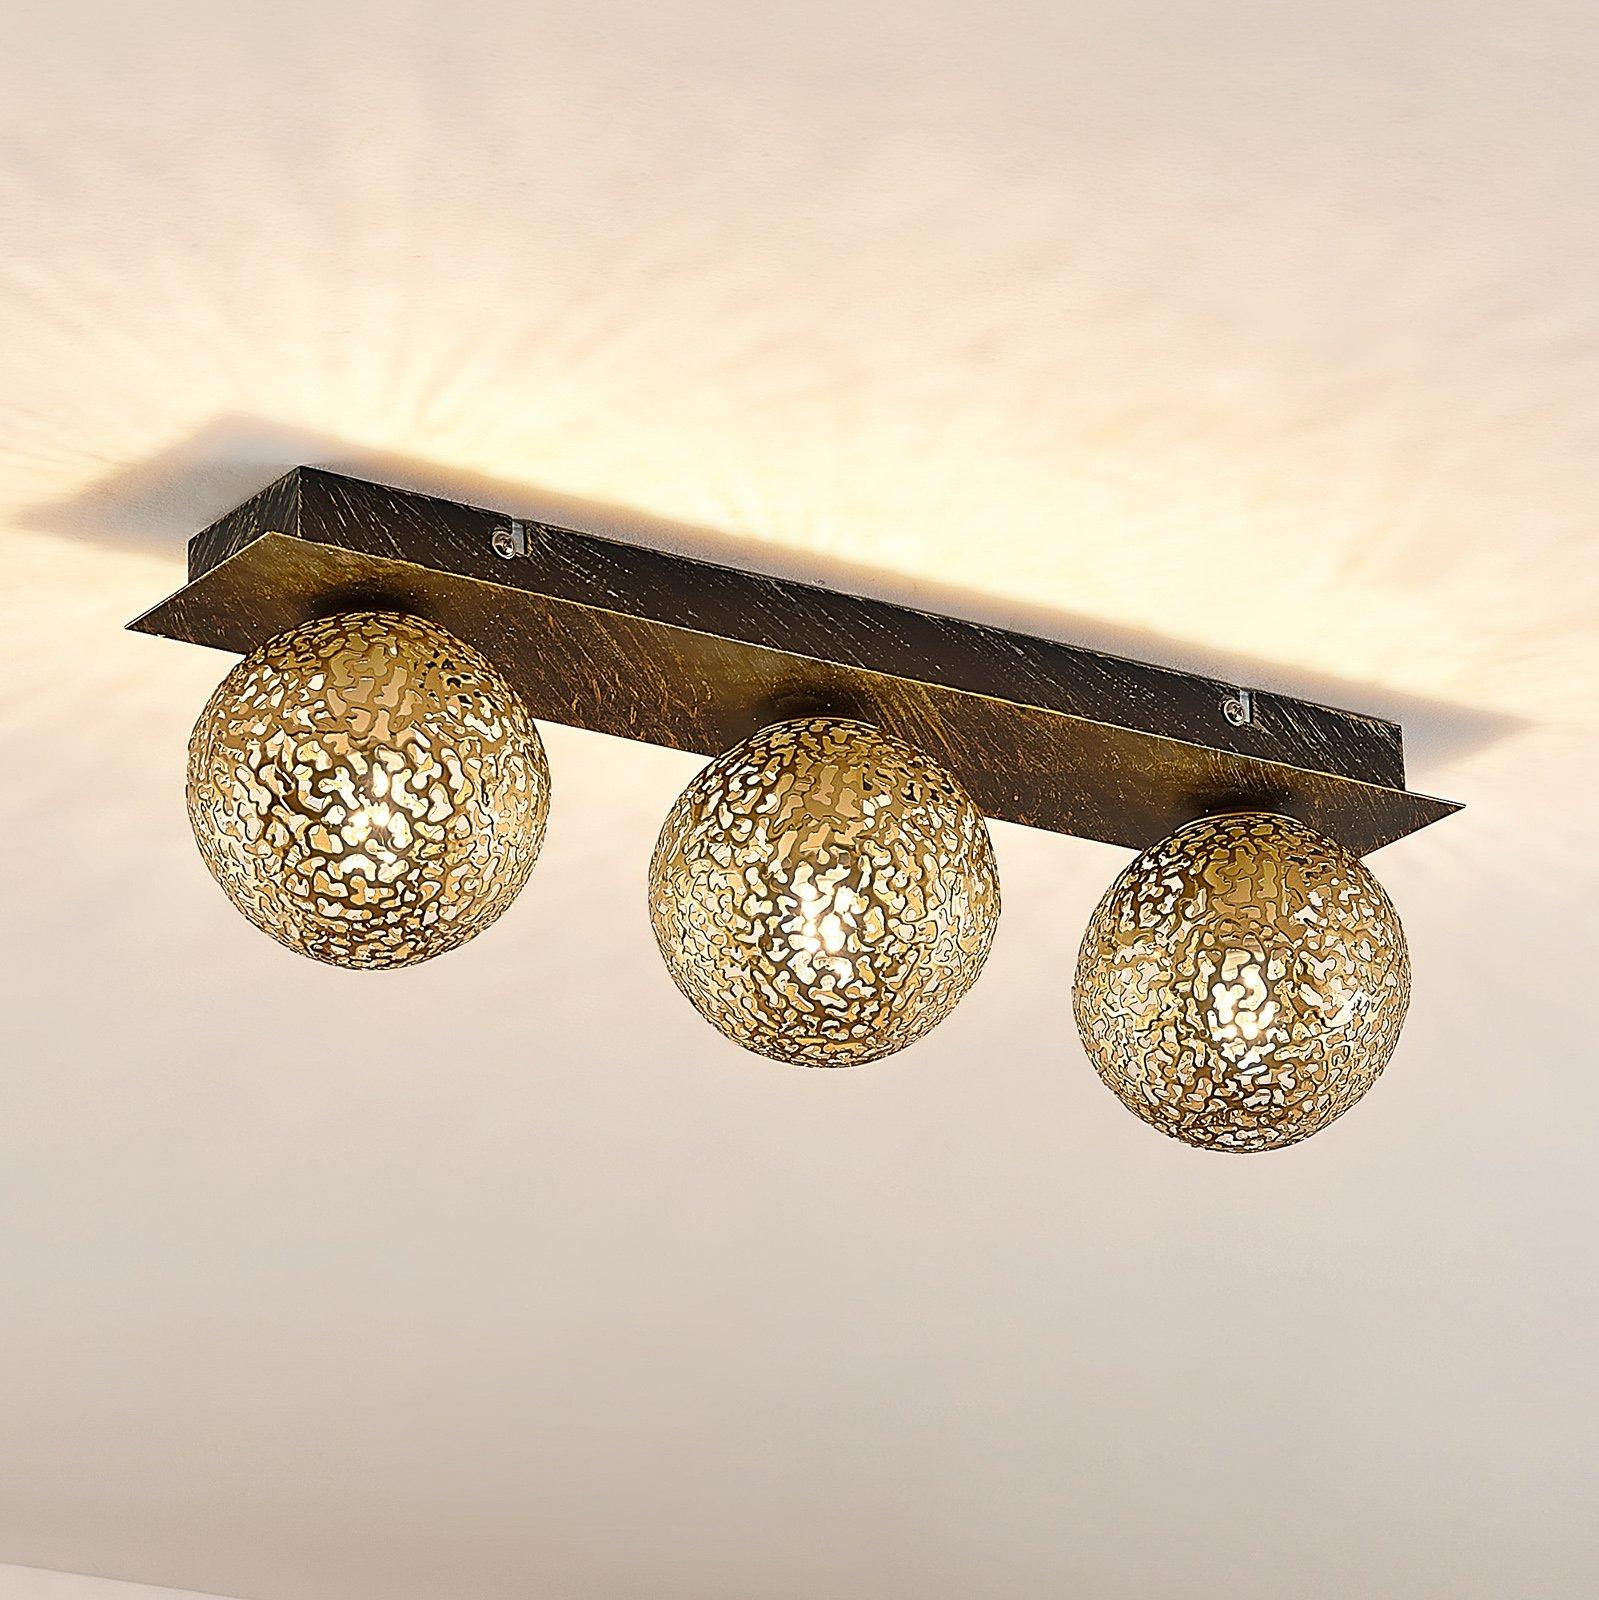 Lucande Evory taklampe, kantet, 3 lyskilder